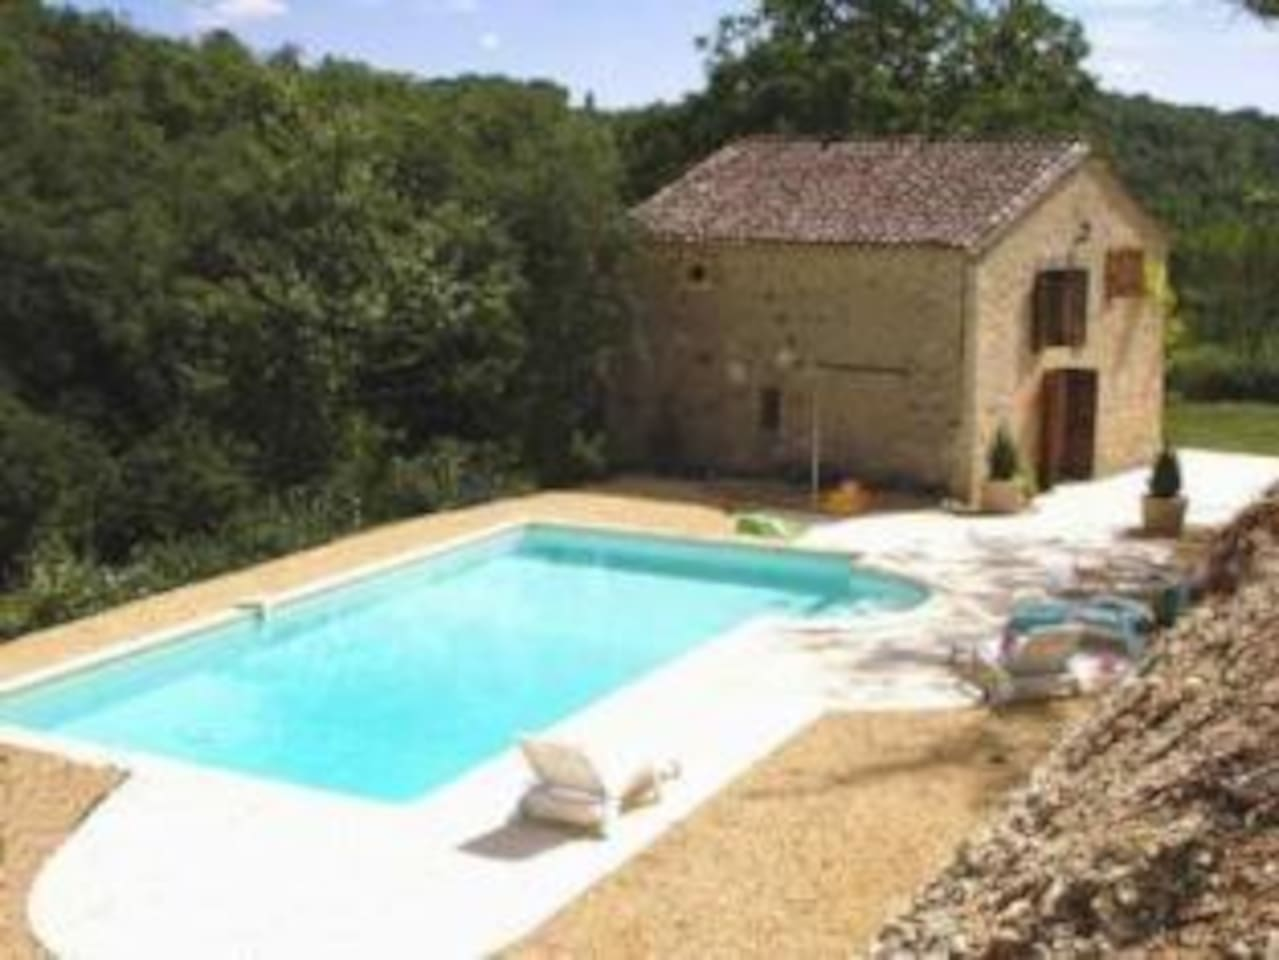 Private, sunny swimming pool